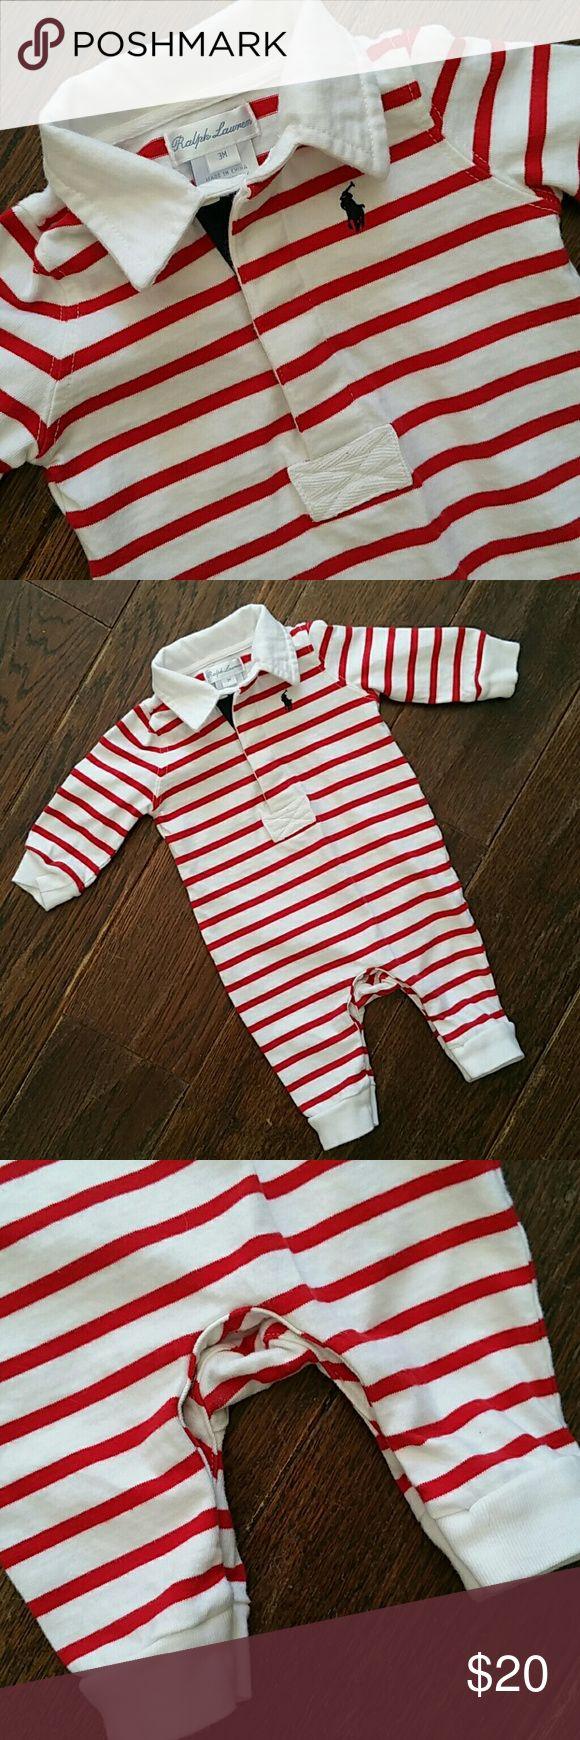 Ralph Lauren nautical jumpsuit. 3 mos. A super cute red and white striped nautical collared jumper 100% cotton made by Ralph Lauren Ralph Lauren One Pieces